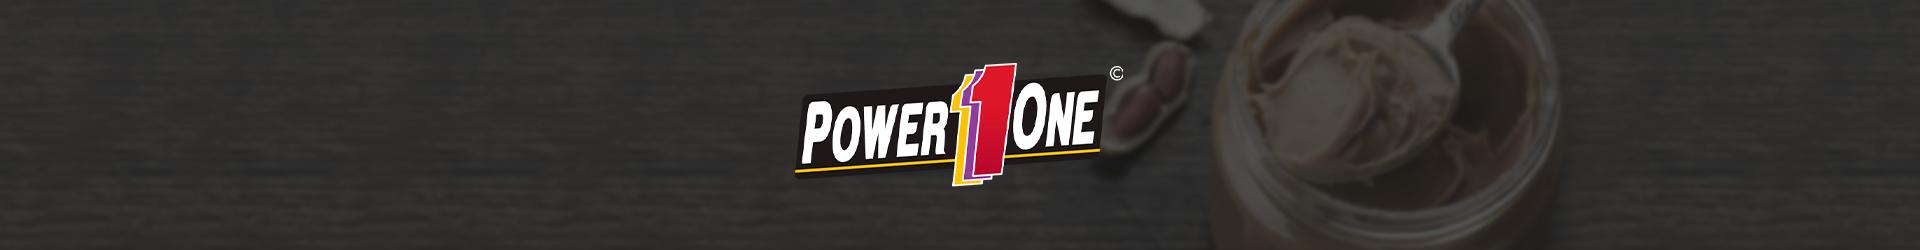 MARCA - Power1One